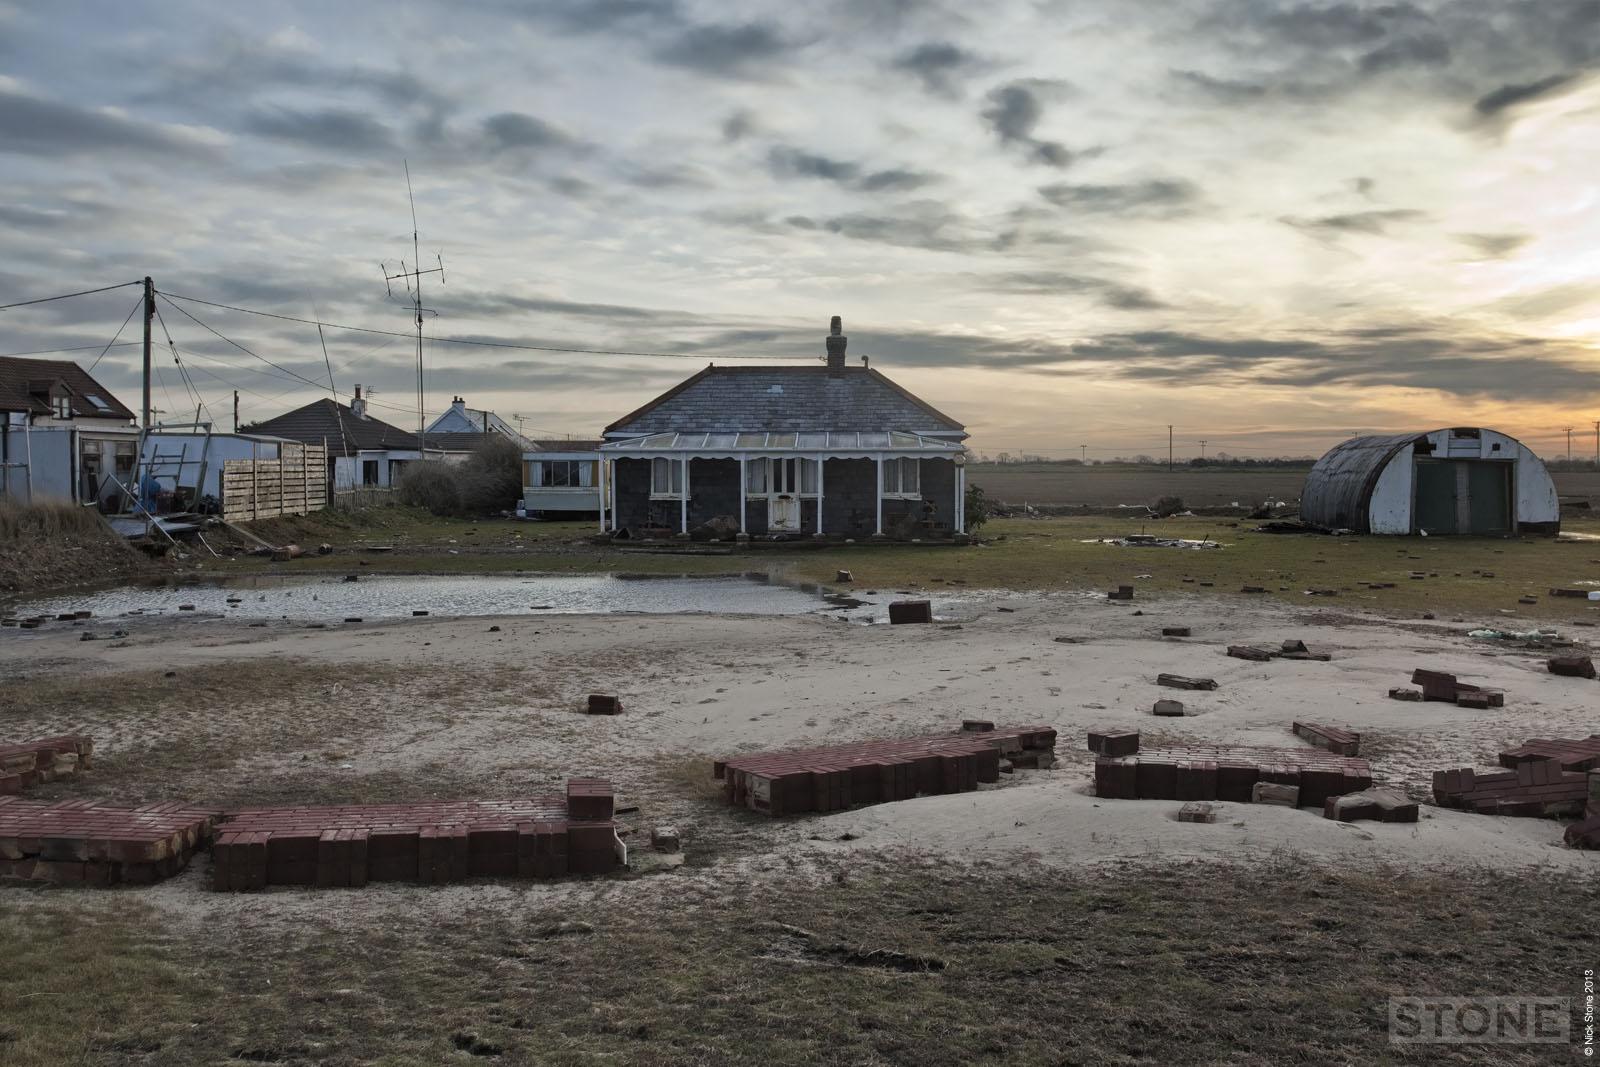 © Nick Stone Walcott norfolk surge cottage chalet damage sea 3